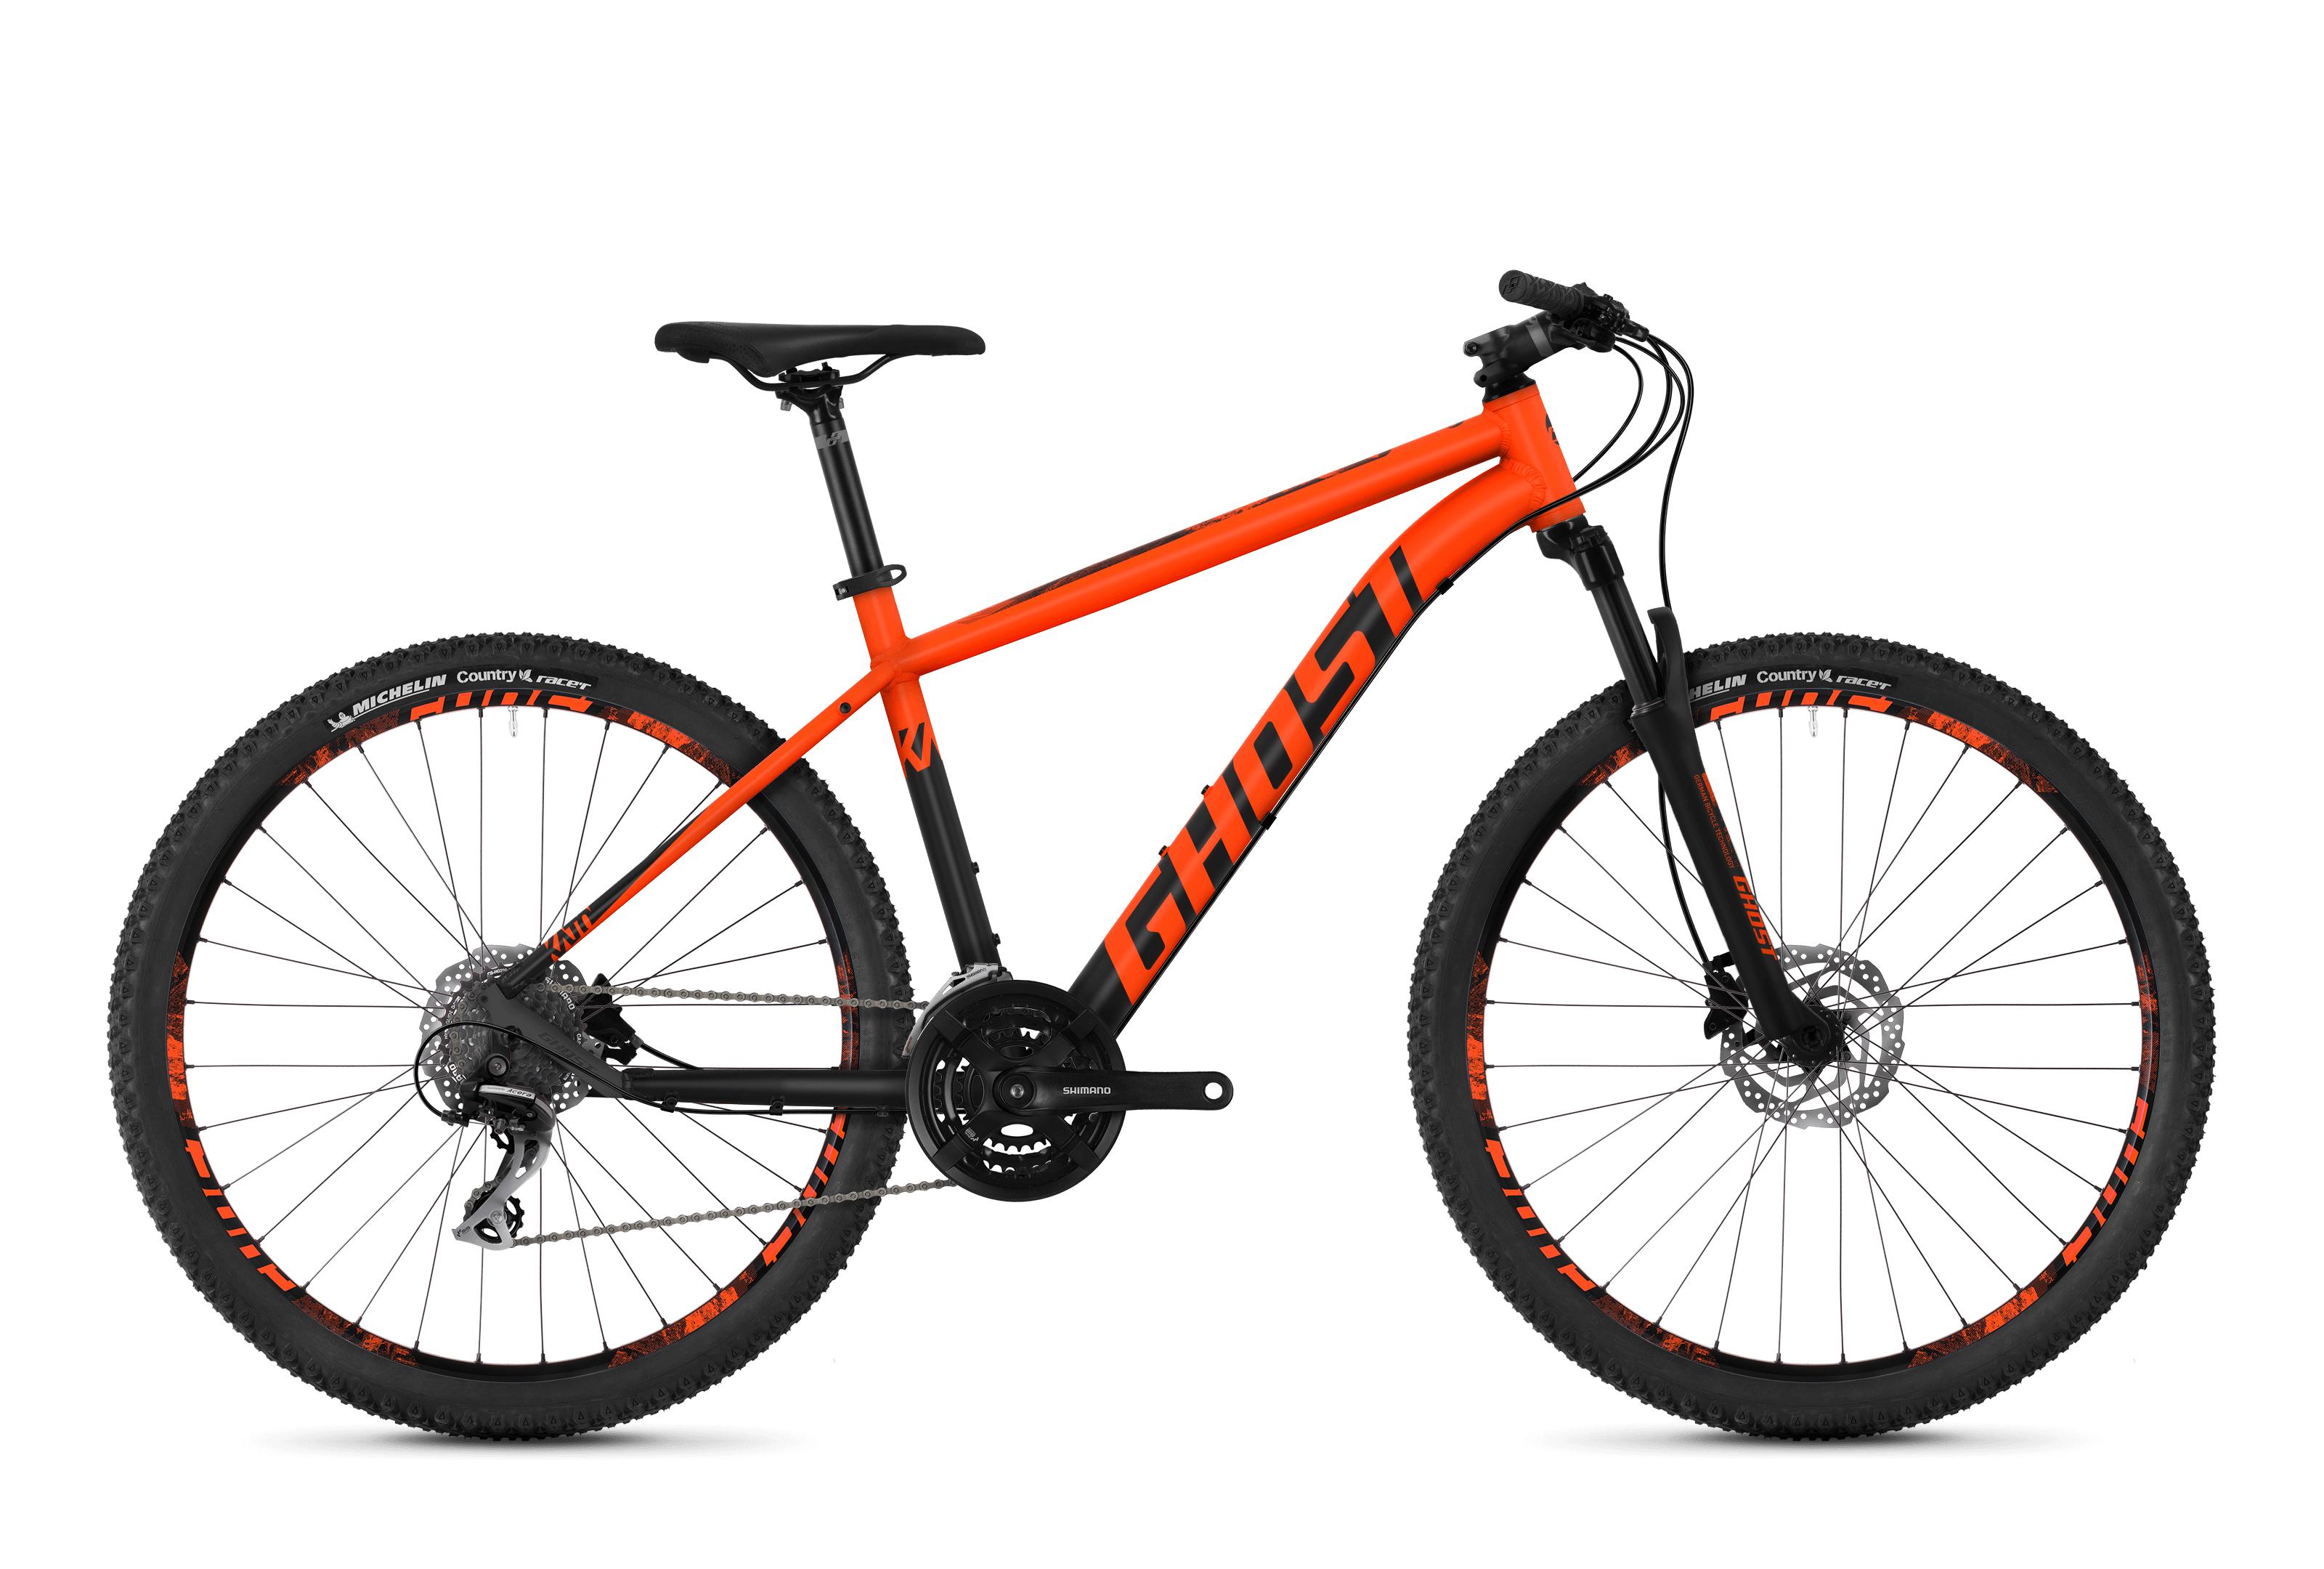 Horské kolo GHOST Kato 3.7 orange / black S 2018